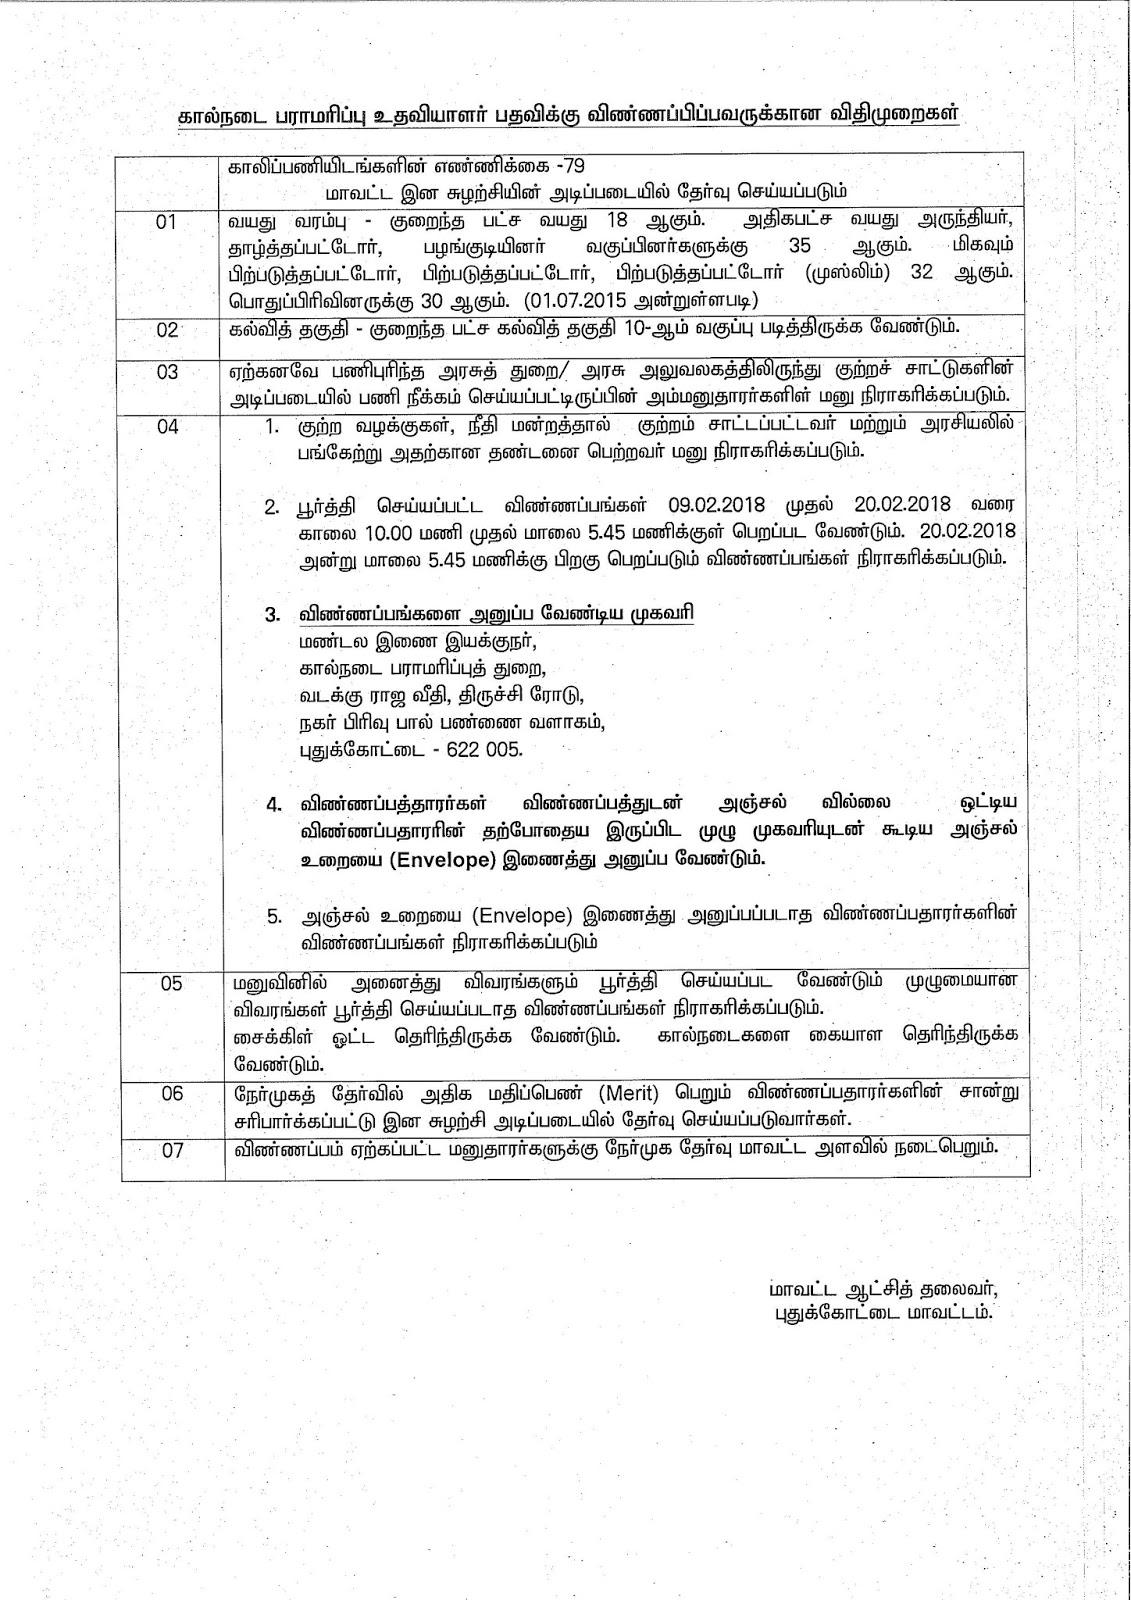 THAHD Animal Husbandry Dept Pudukottai Recruitment for 79 Assistant Jobs Details